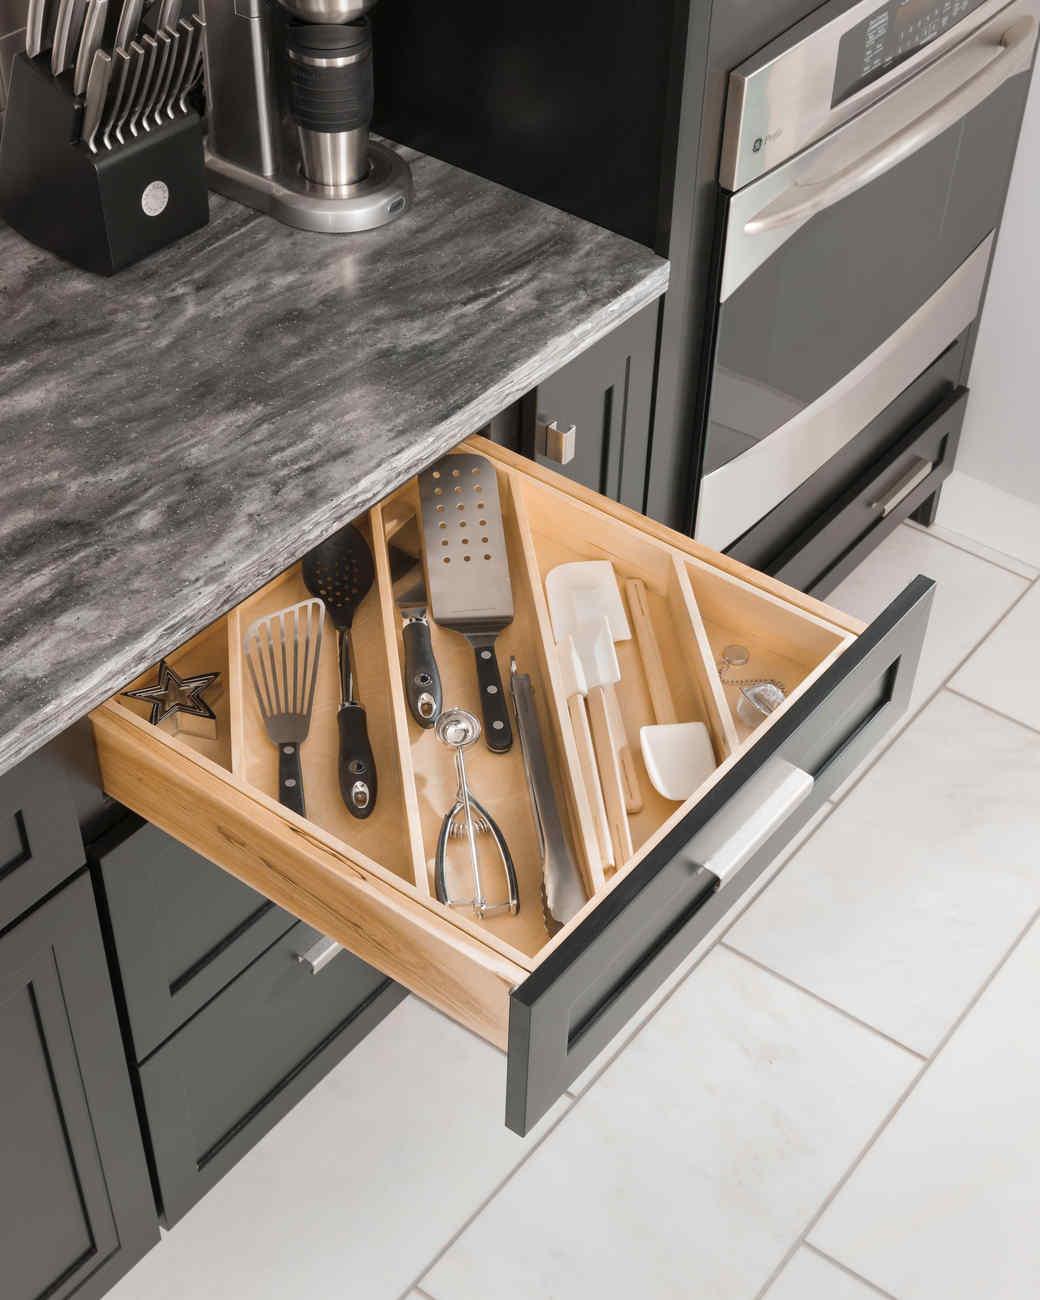 thd-chef-utensildrawer-0315.jpg